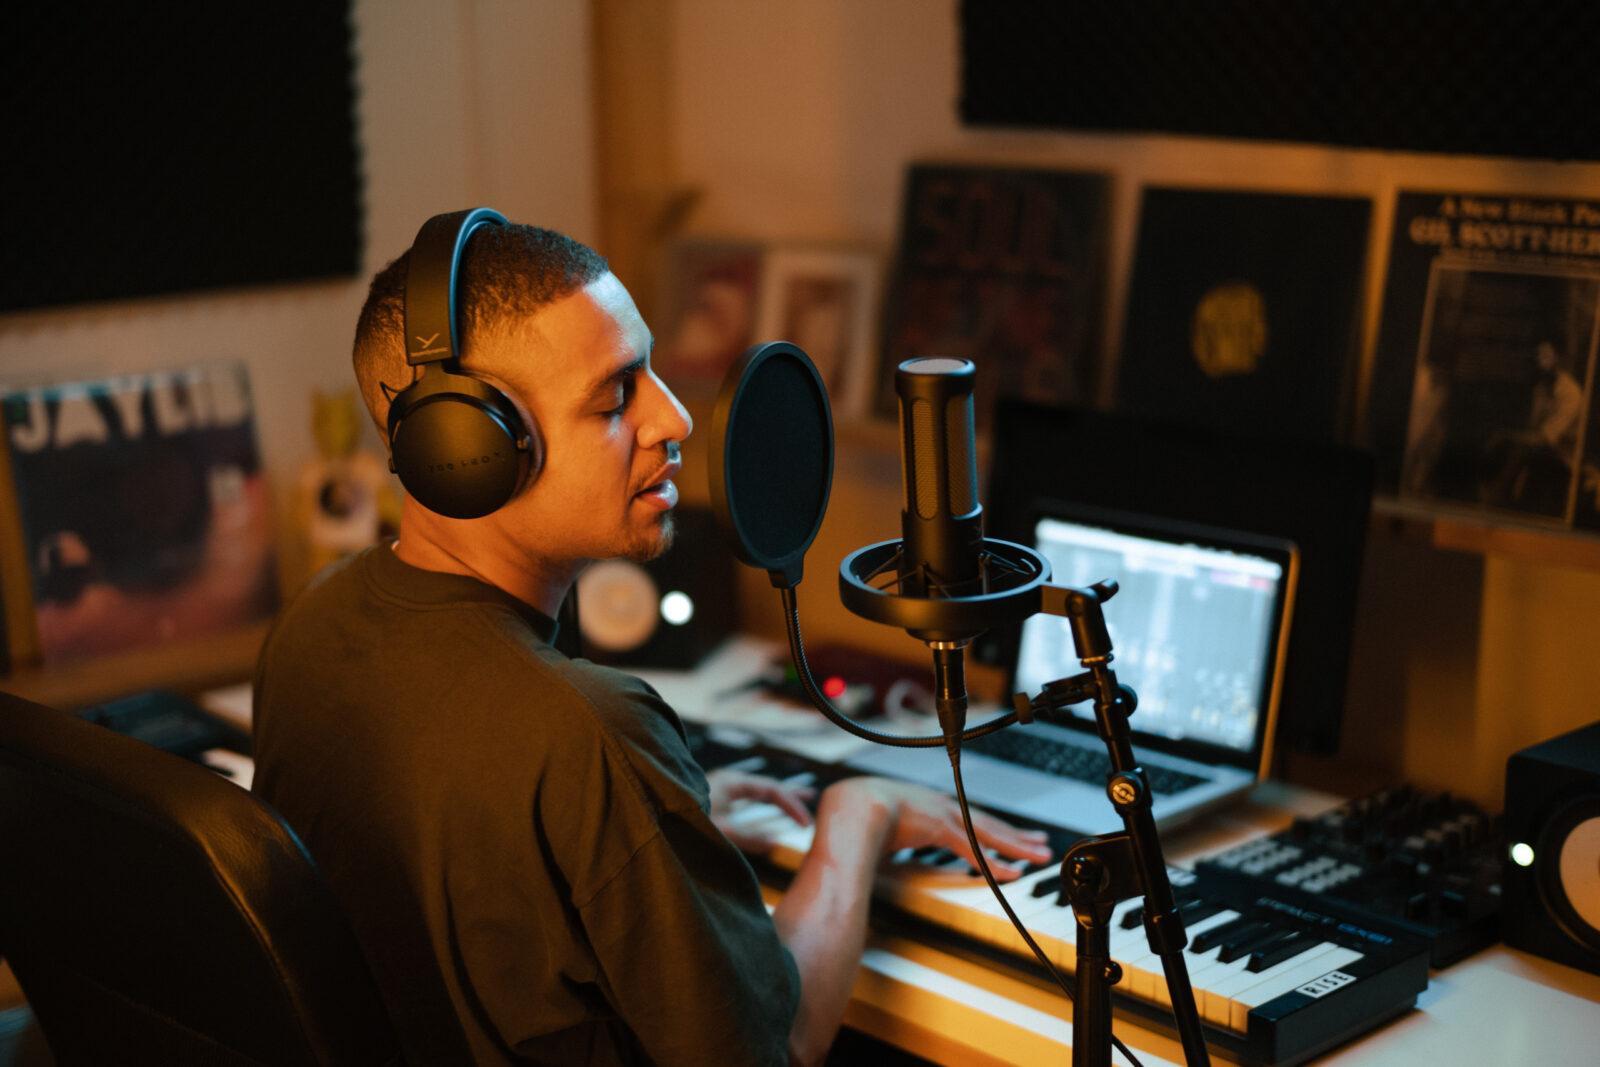 Beyerdynamic представила новые наушники и микрофоны PRO X для креаторов (csm PIC M90 DT700PRO X 21 08 Alex Studio v13 aa66665a1e)